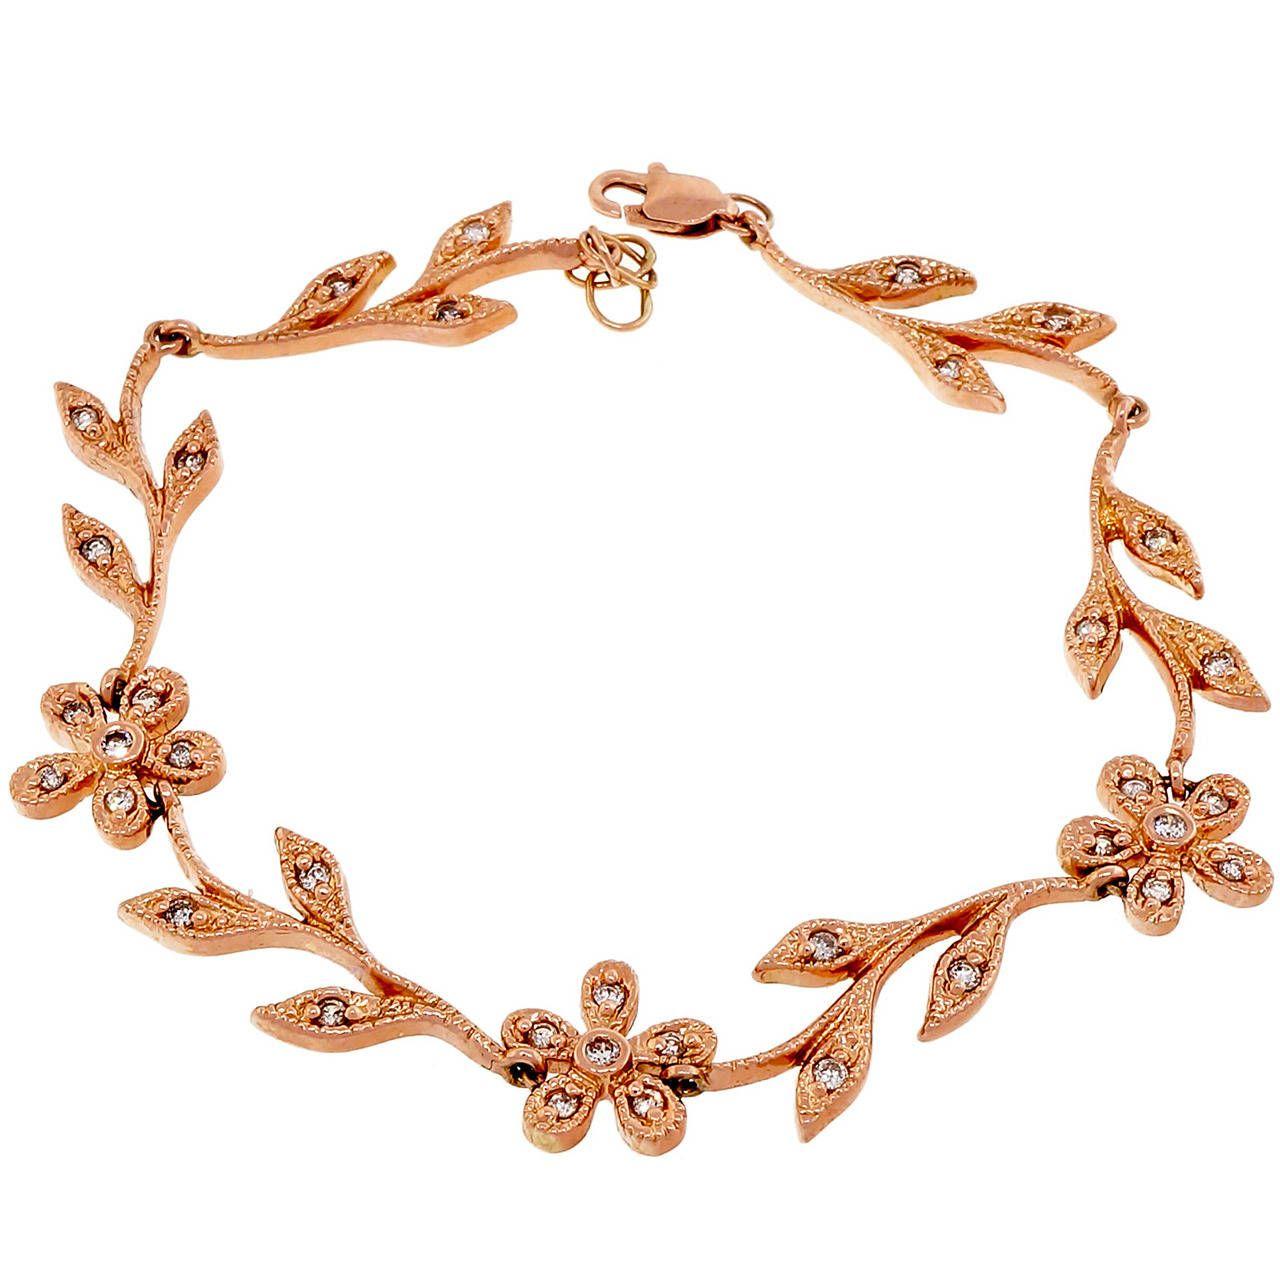 Diamond Gold Flower and Vine Bracelet   From a unique collection of vintage modern bracelets at https://www.1stdibs.com/jewelry/bracelets/modern-bracelets/